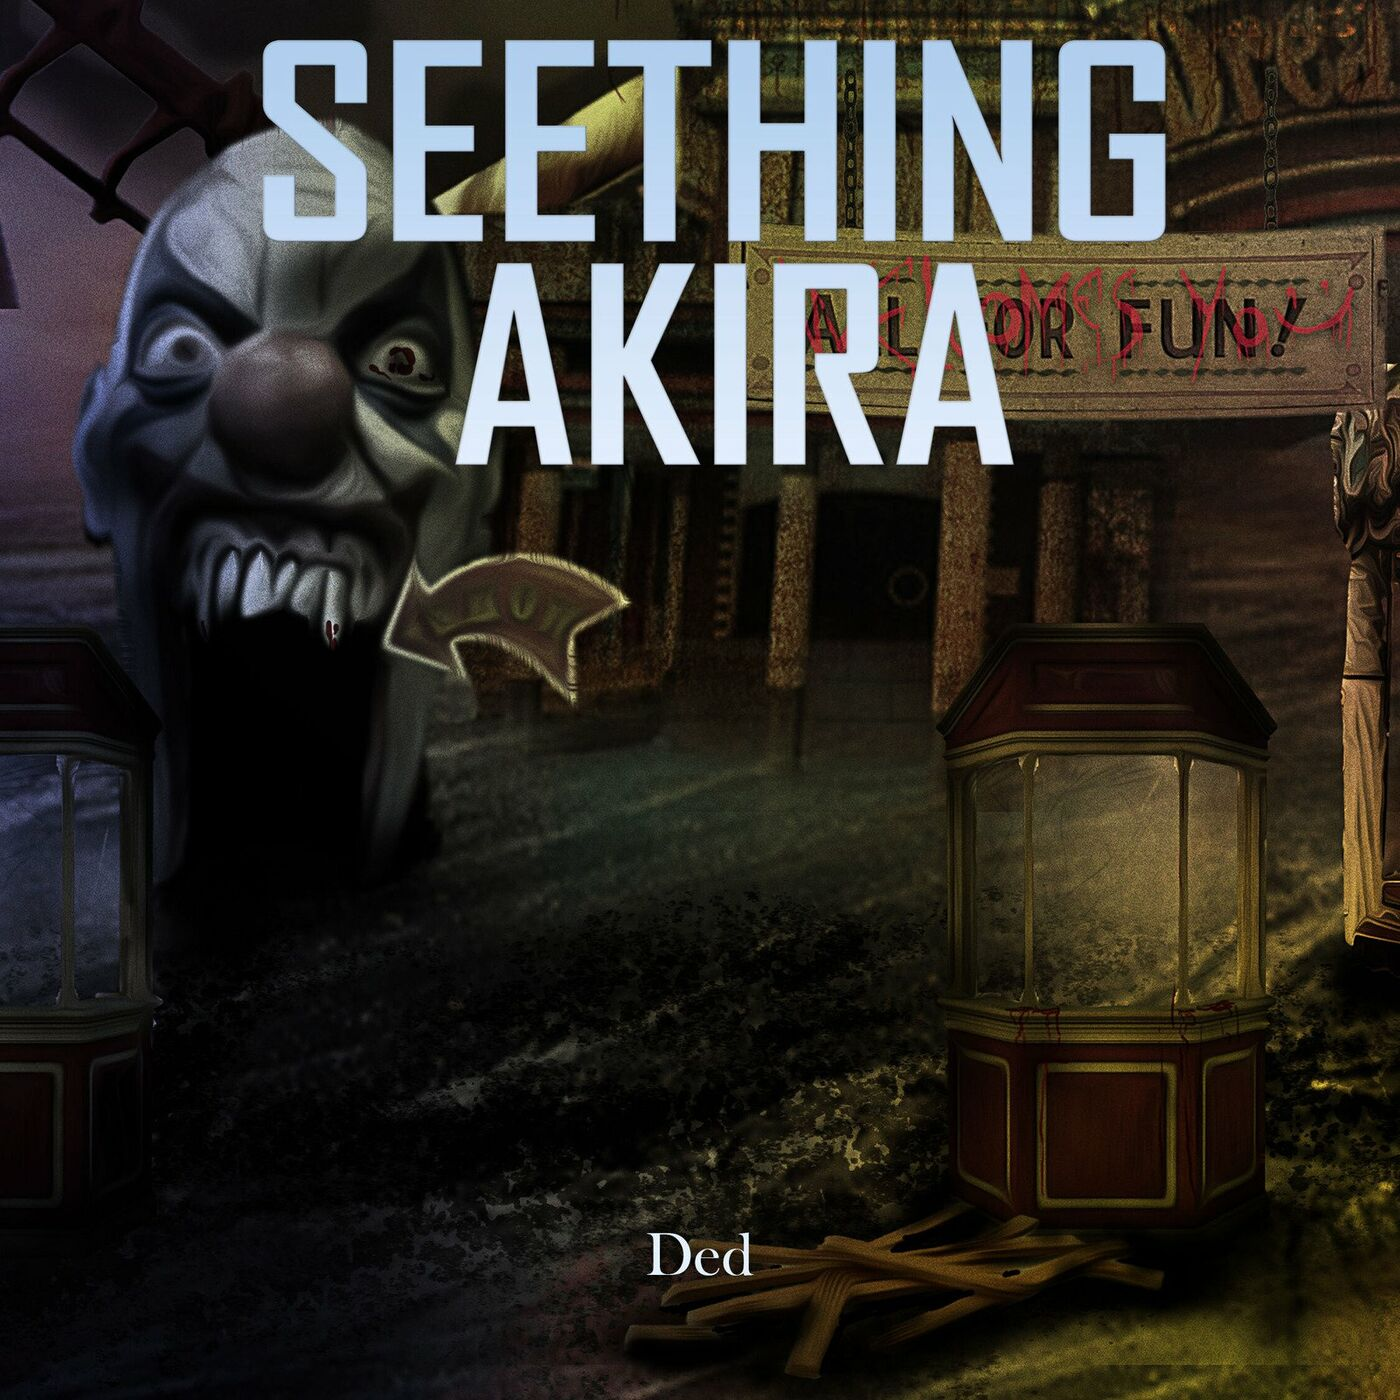 Seething Akira - Ded [single] (2021)